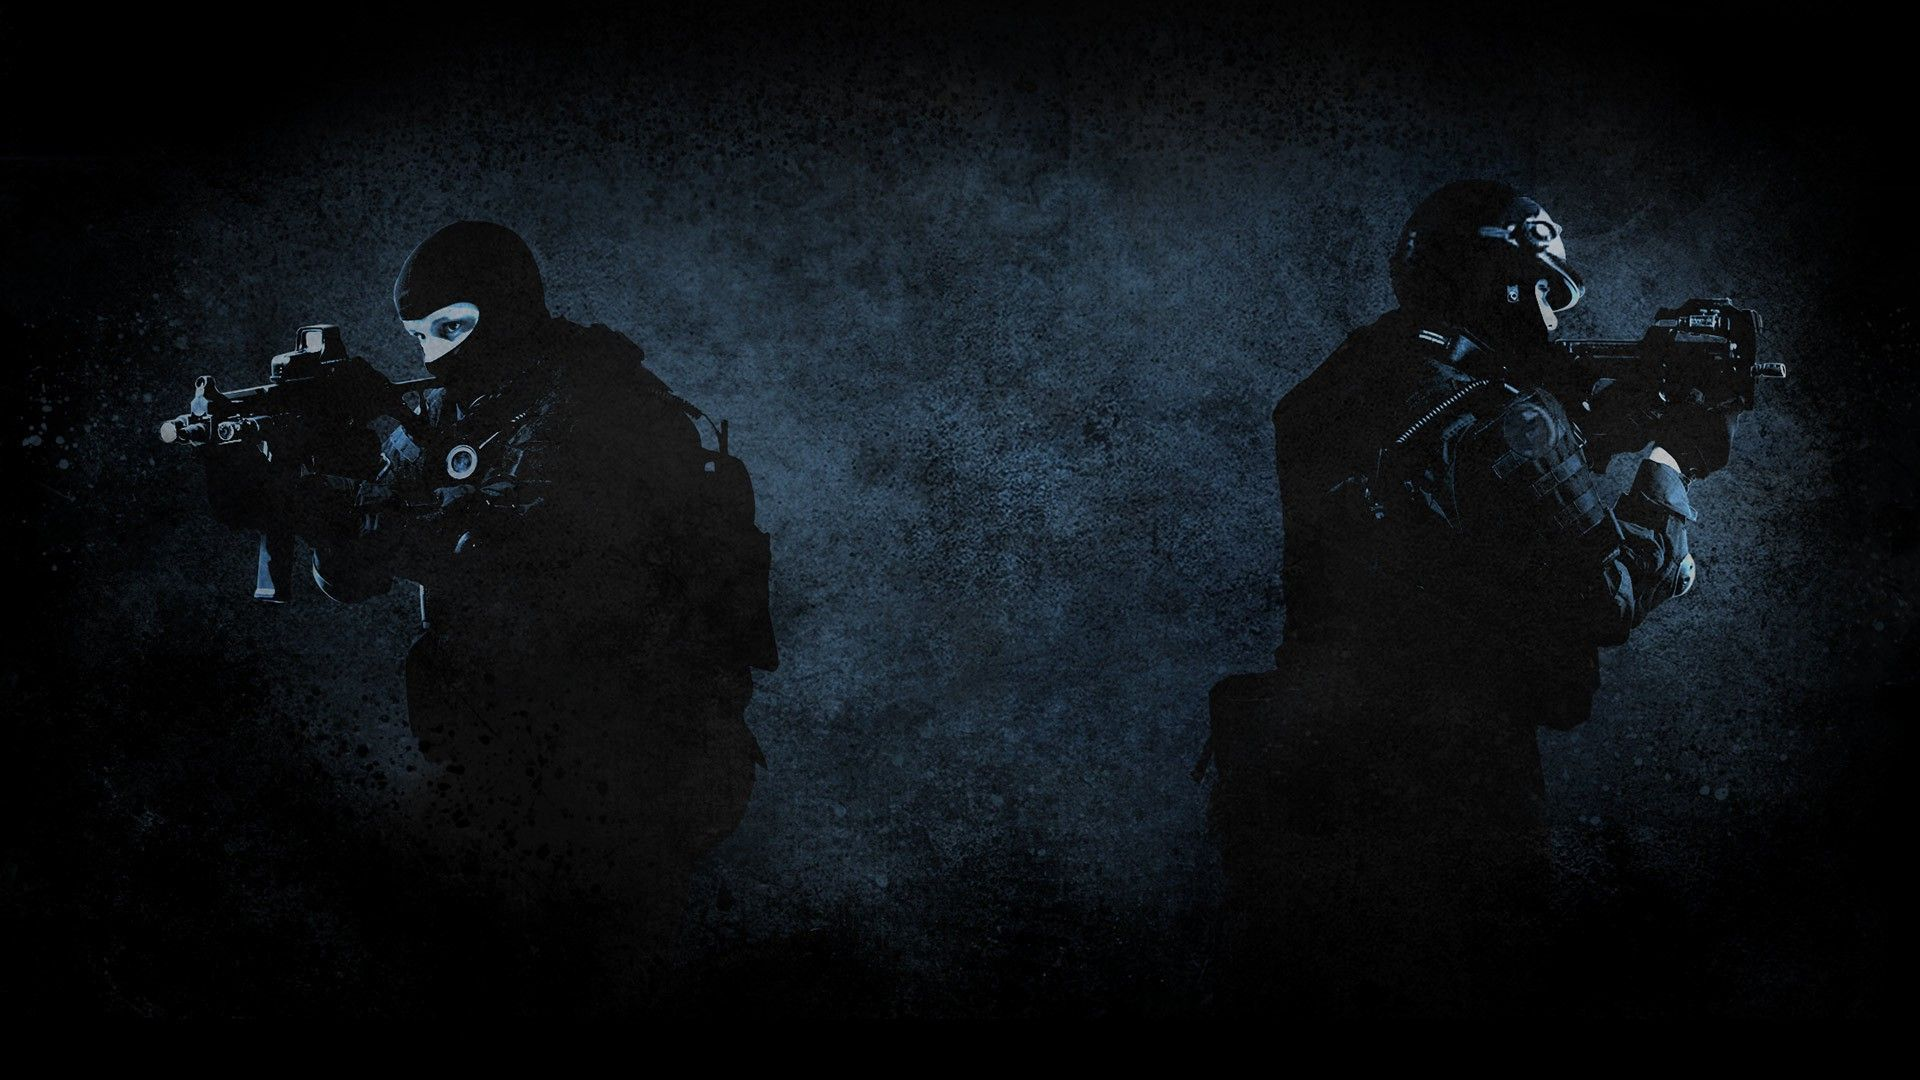 Counter-Strike-wallpaper-wp3804099